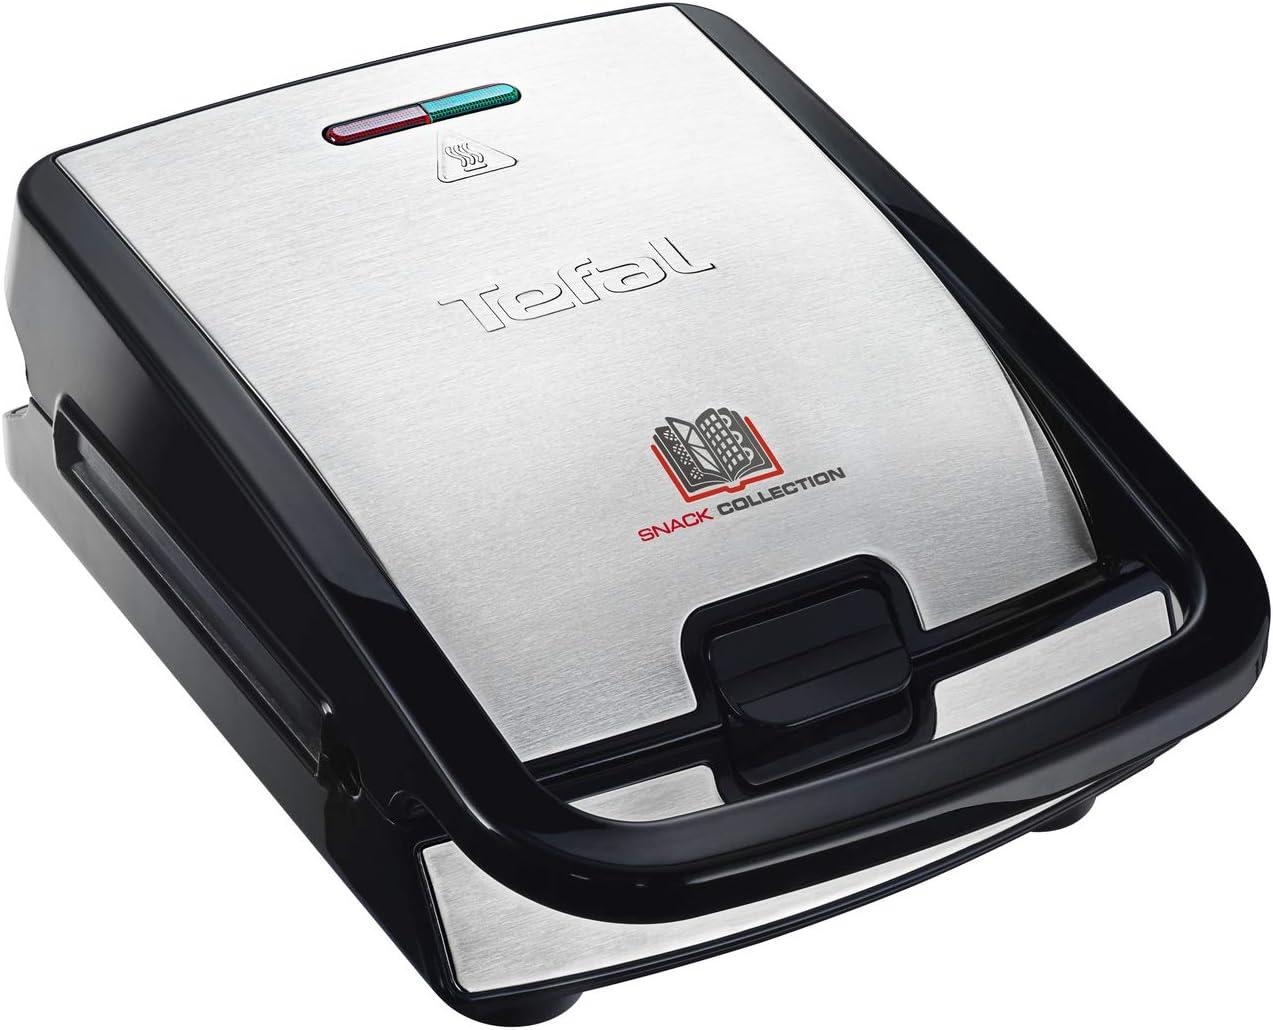 Tefal SW852D - Sandwichera, 700 W, revestimiento antiadherente ...